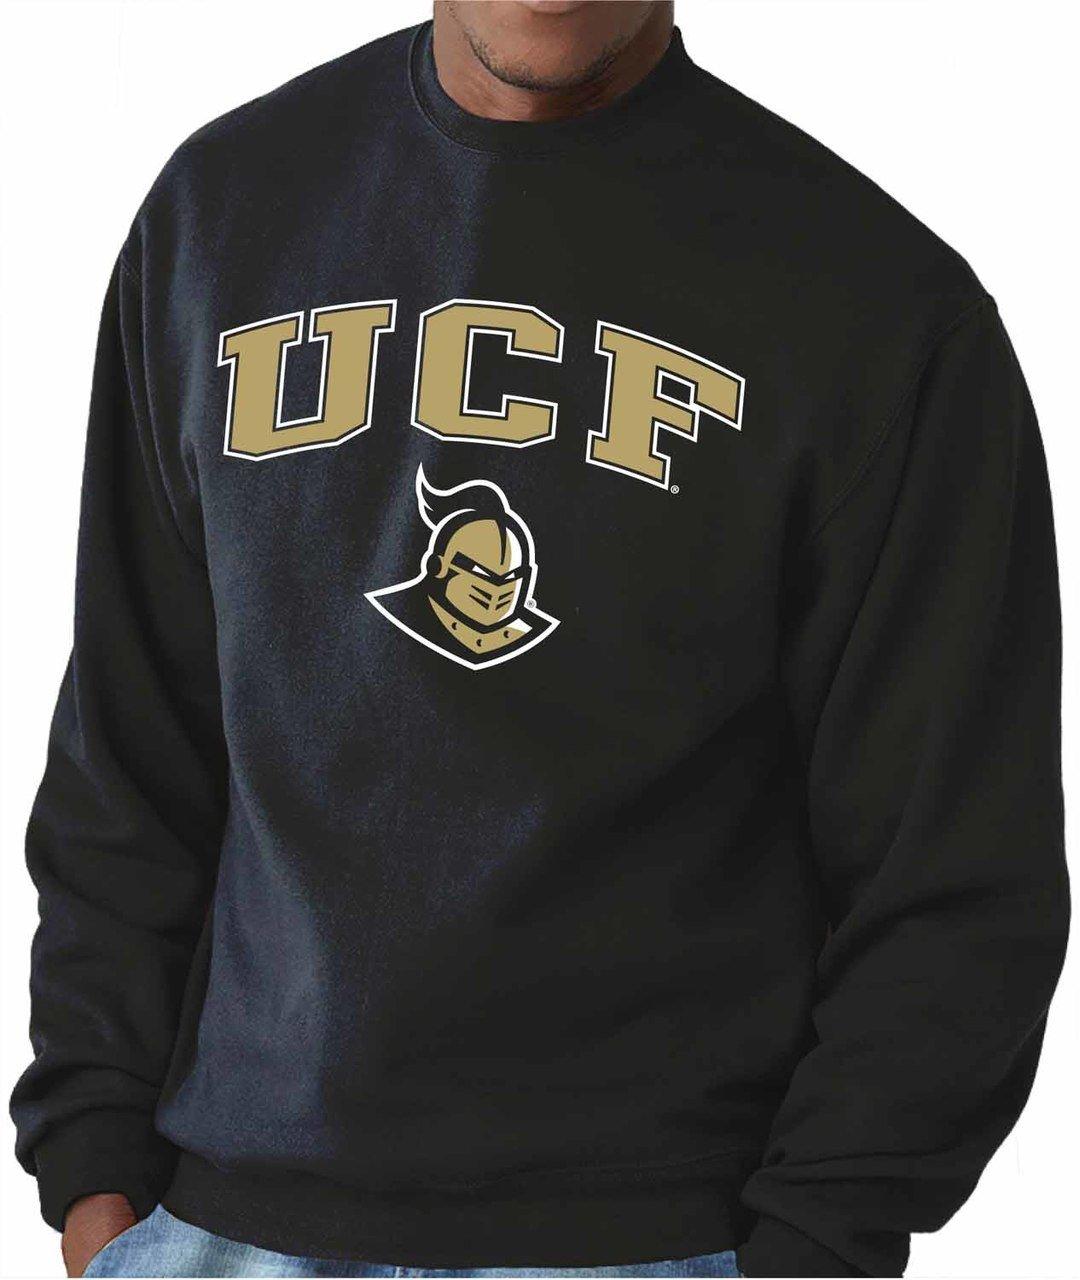 Central Florida Knights Adult Arch & Logo Gameday Crewneck Sweatshirt - Black, Small